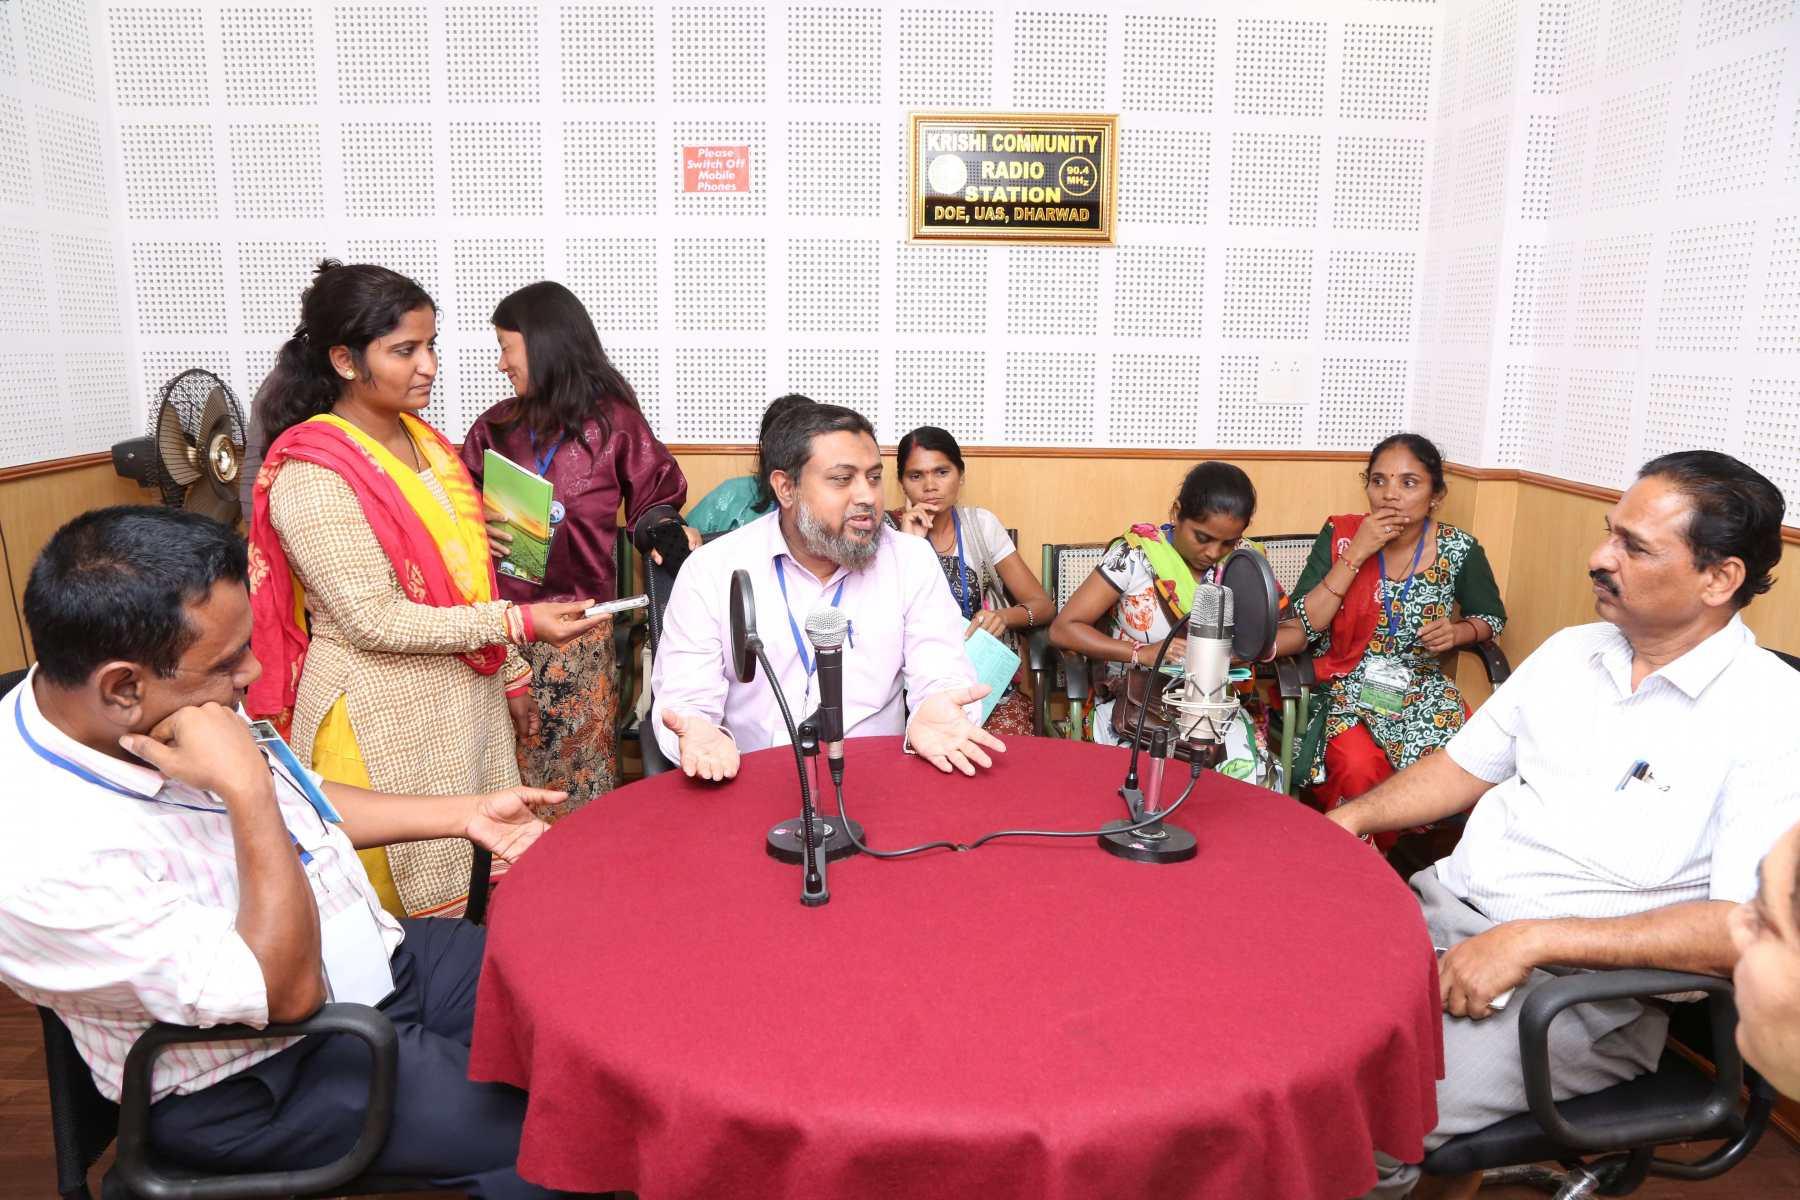 At community Radio station